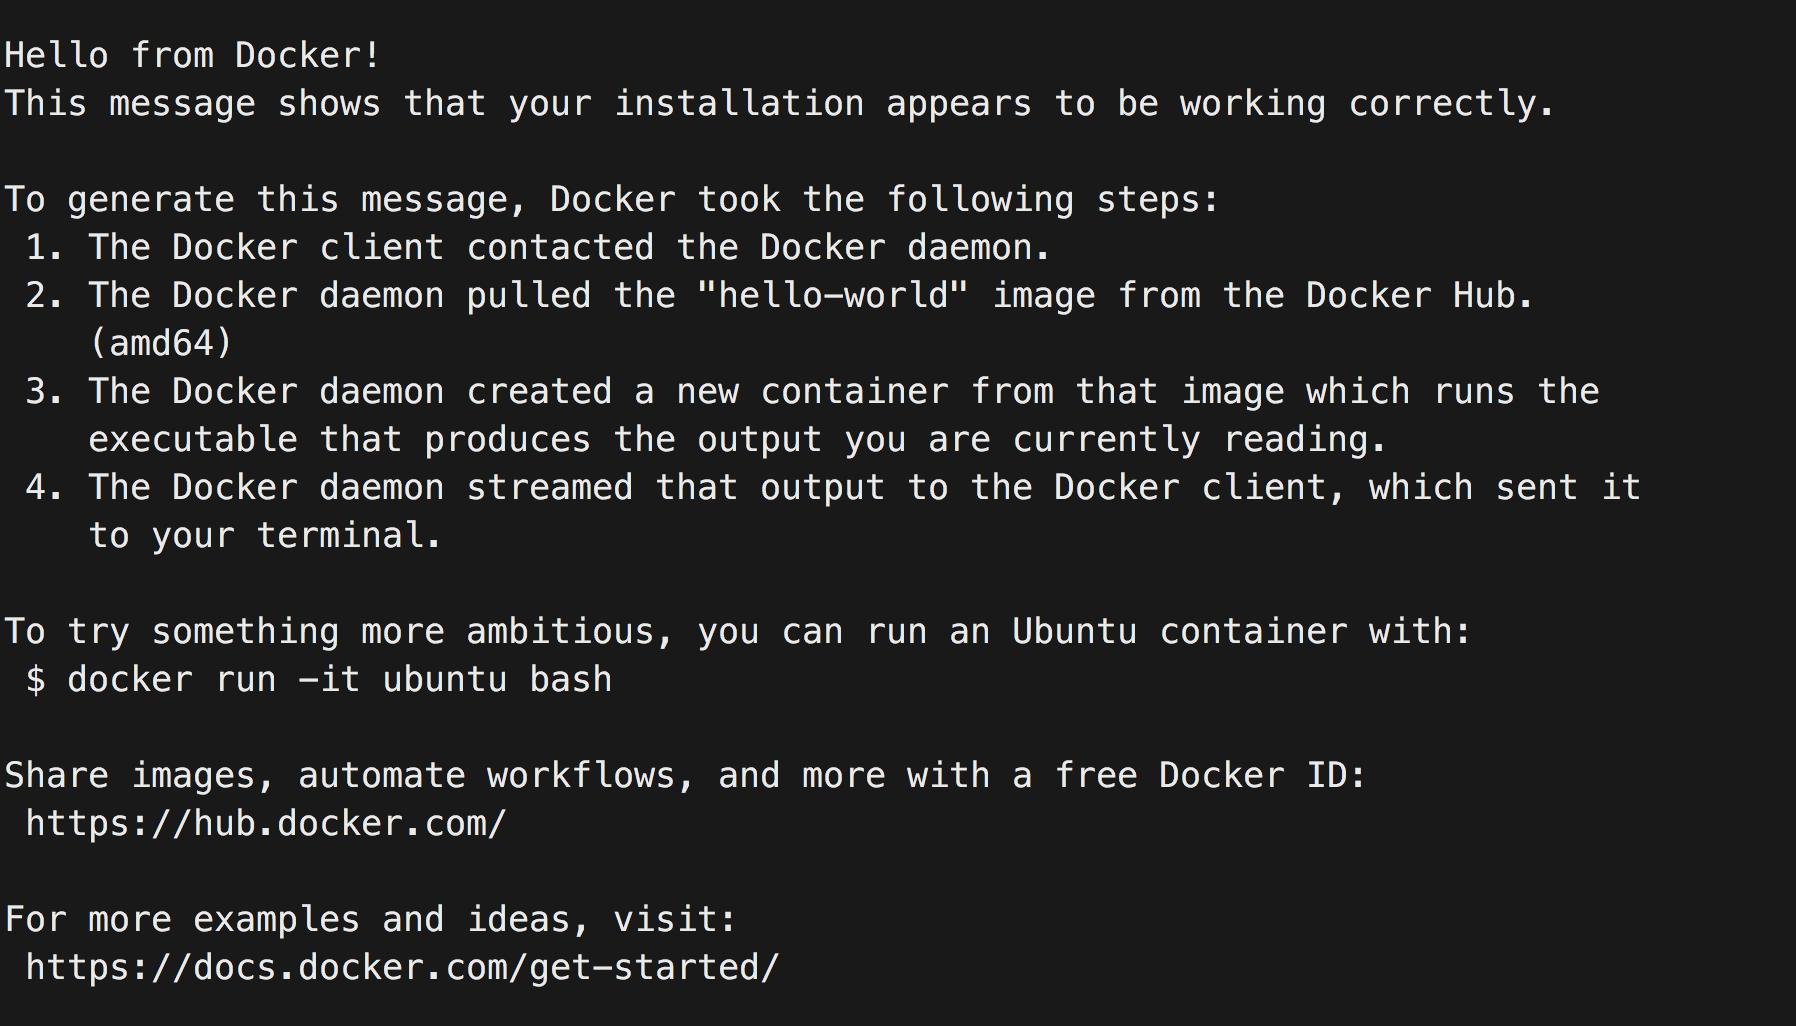 http://server.digimetriq.com/wp-content/uploads/2021/01/Running-a-single-node-Kubernetes-cluster-using-Minikube-on-Ubuntu.png